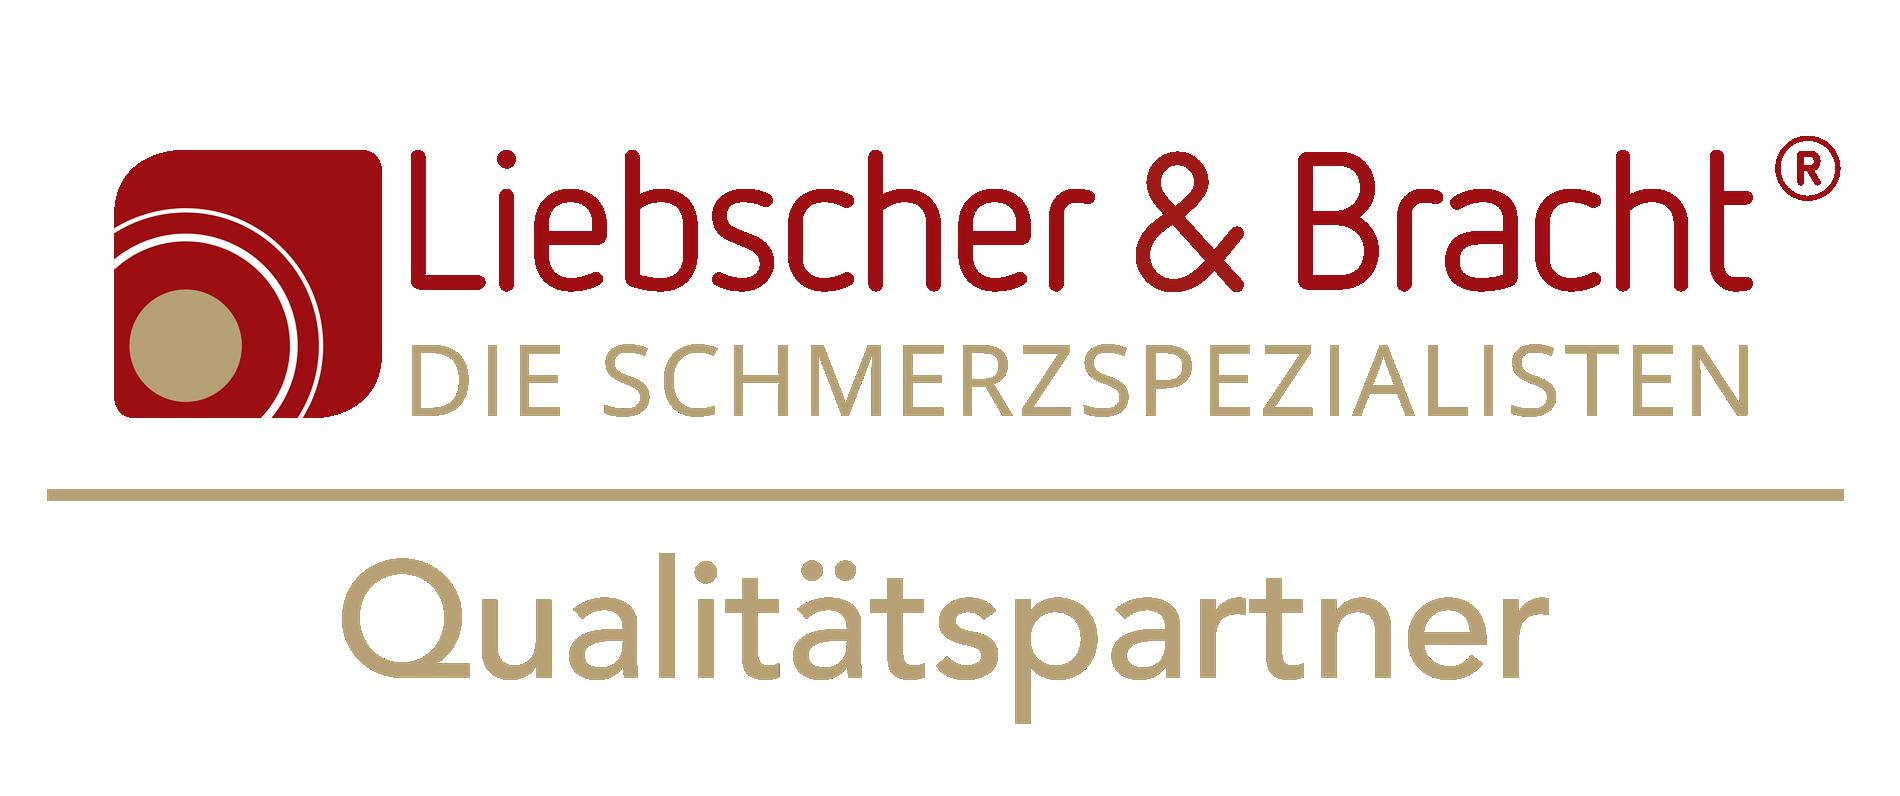 LNB_Logo_2020_Schmerzspezialisten_QP_1900_796